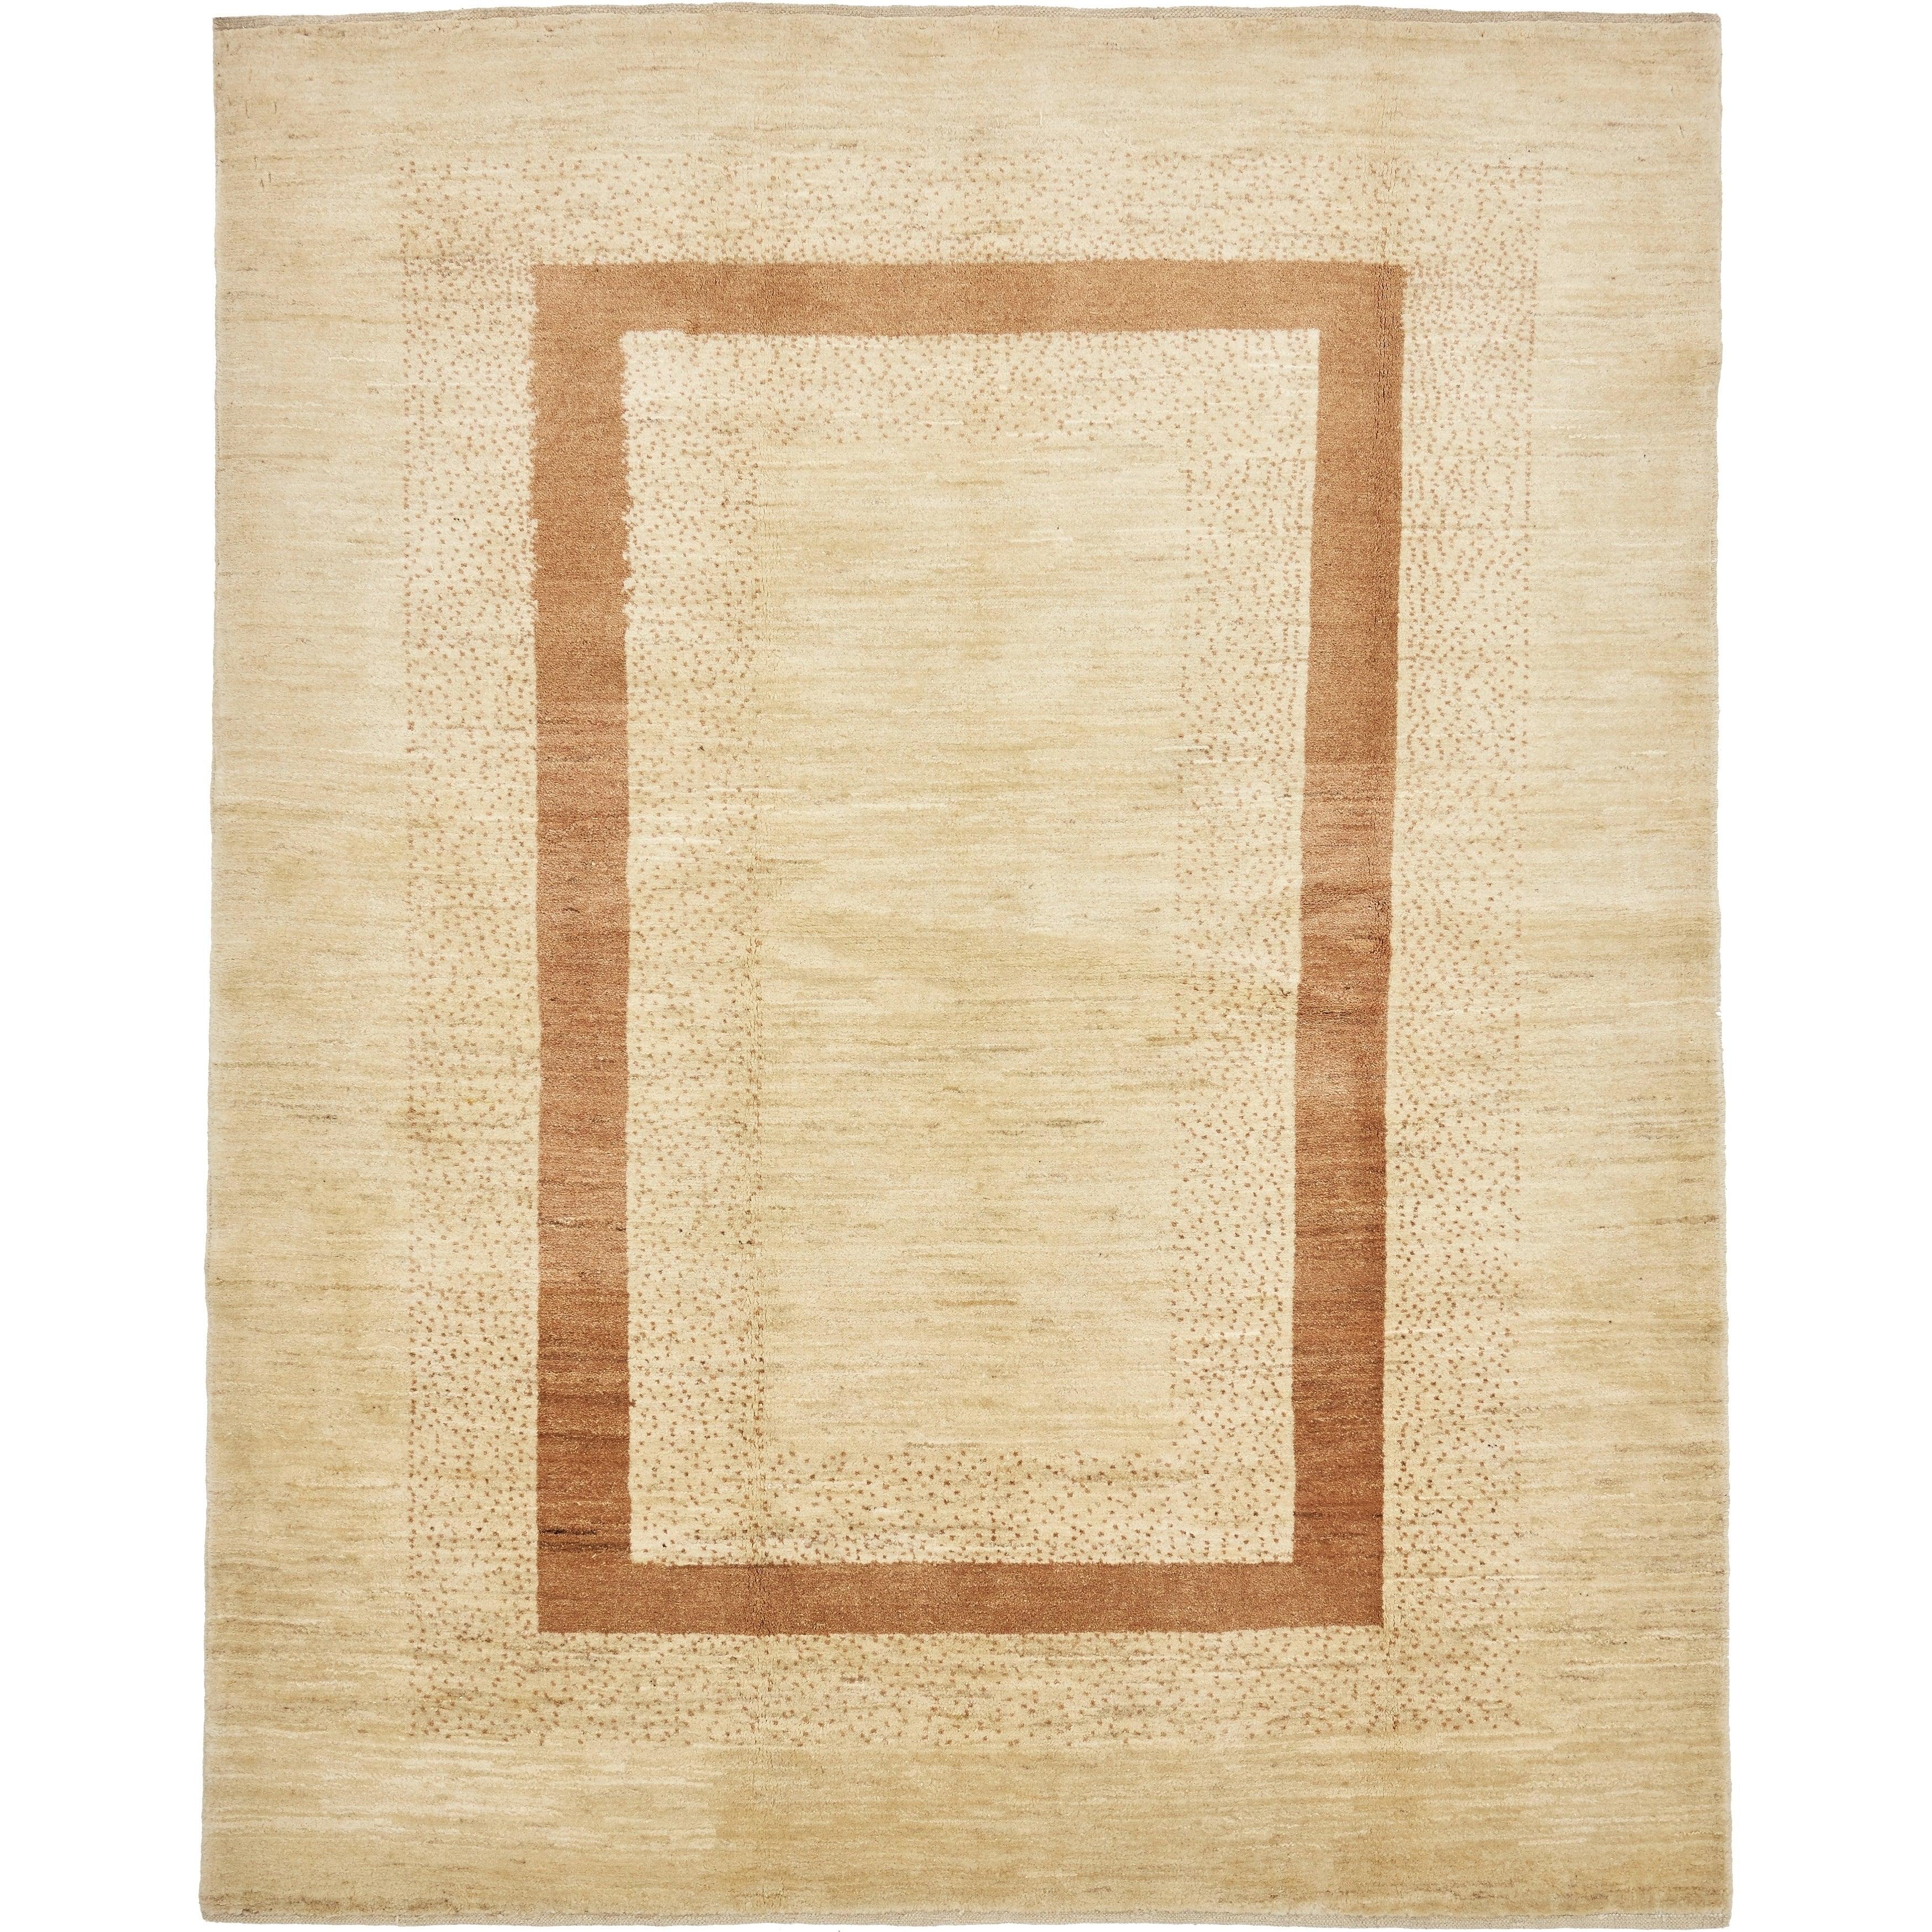 Hand Knotted Kashkuli Gabbeh Wool Area Rug - 5 11 x 7 6 (Beige - 5 11 x 7 6)